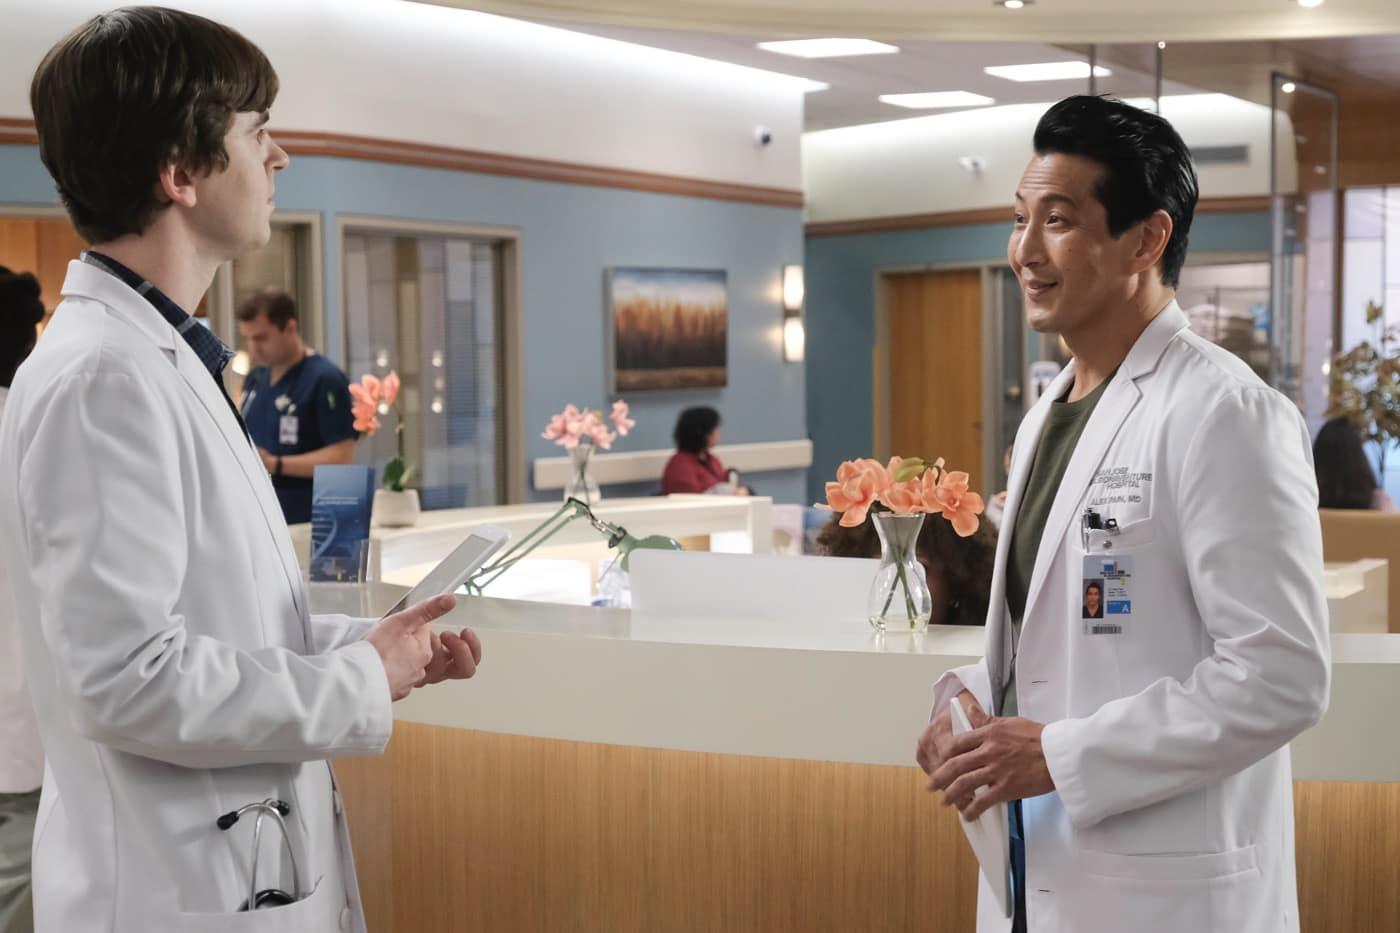 THE GOOD DOCTOR Season 4 Episode 9 FREDDIE HIGHMORE, WILL YUN LEE